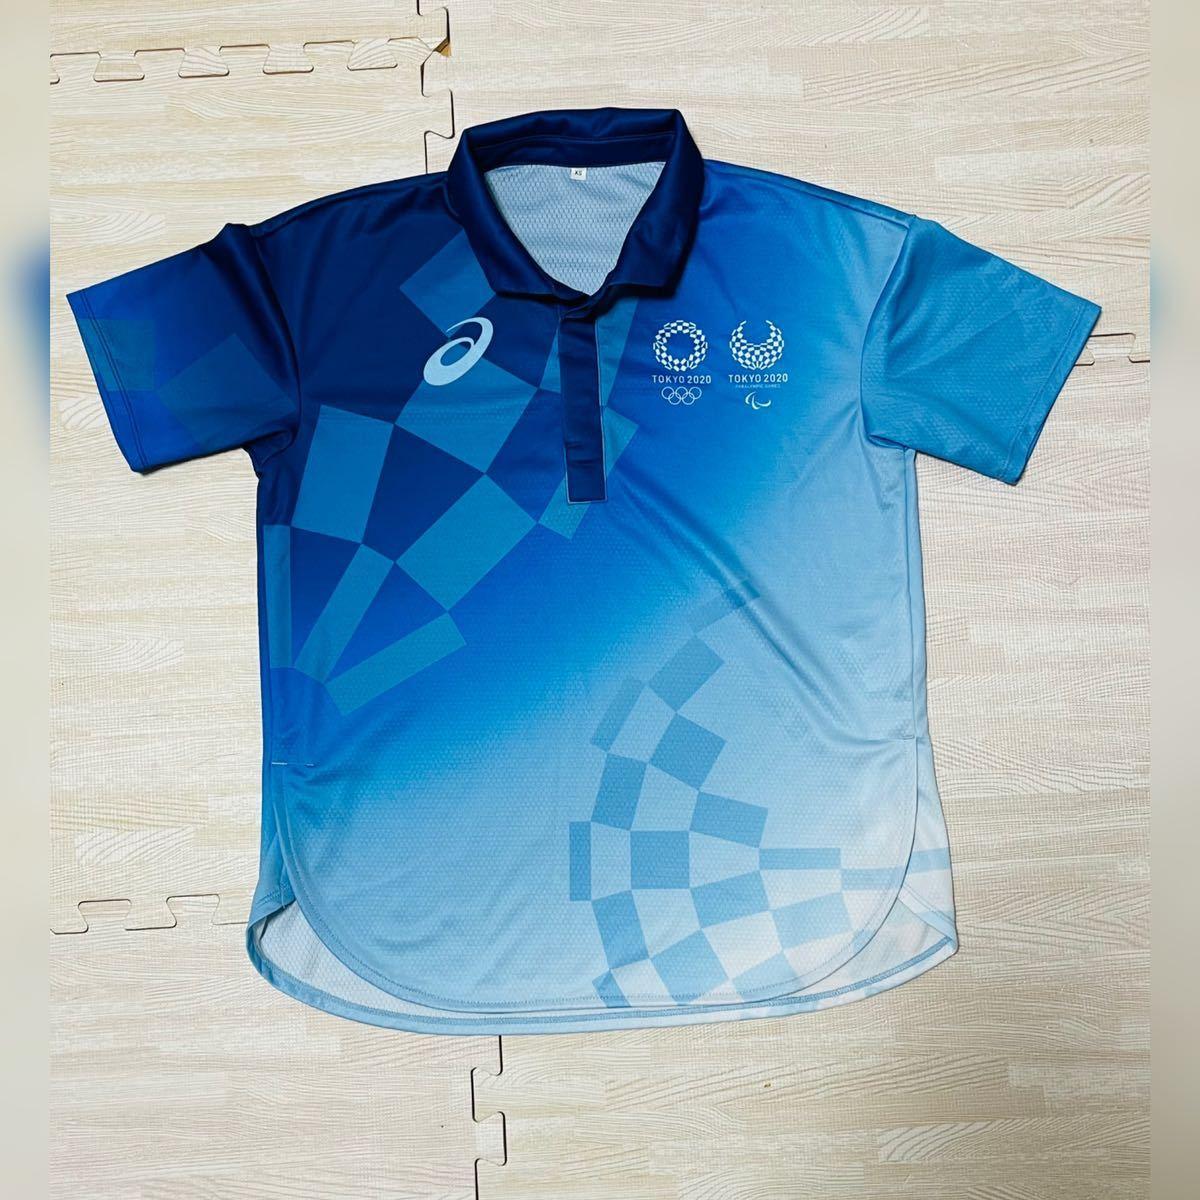 【2XS】東京オリンピック2020 ポロシャツ 未使用_画像1